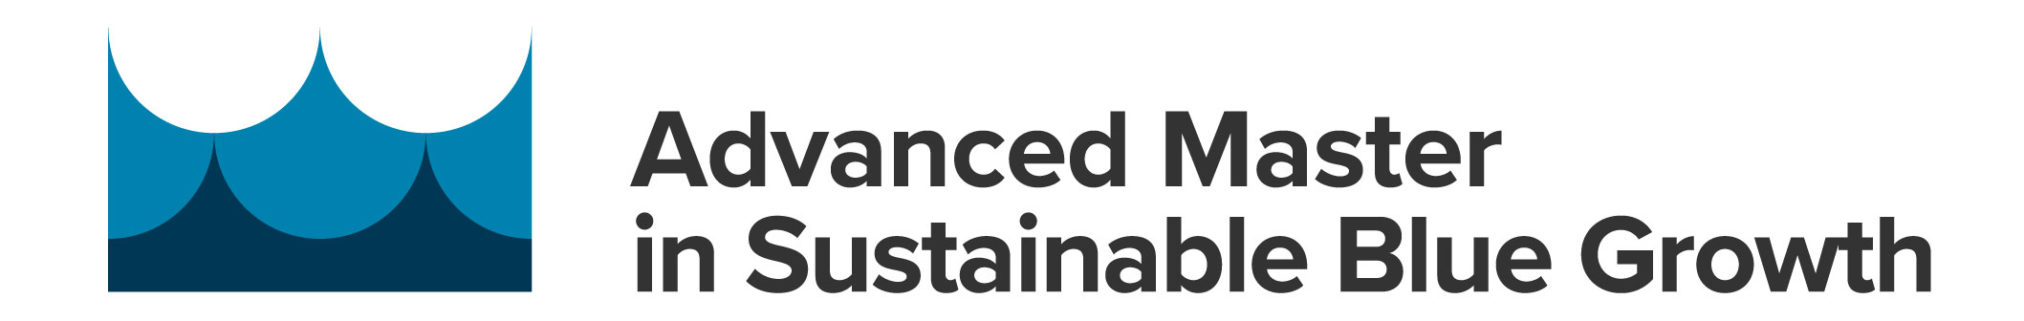 Sustainable Blue Growth - logo